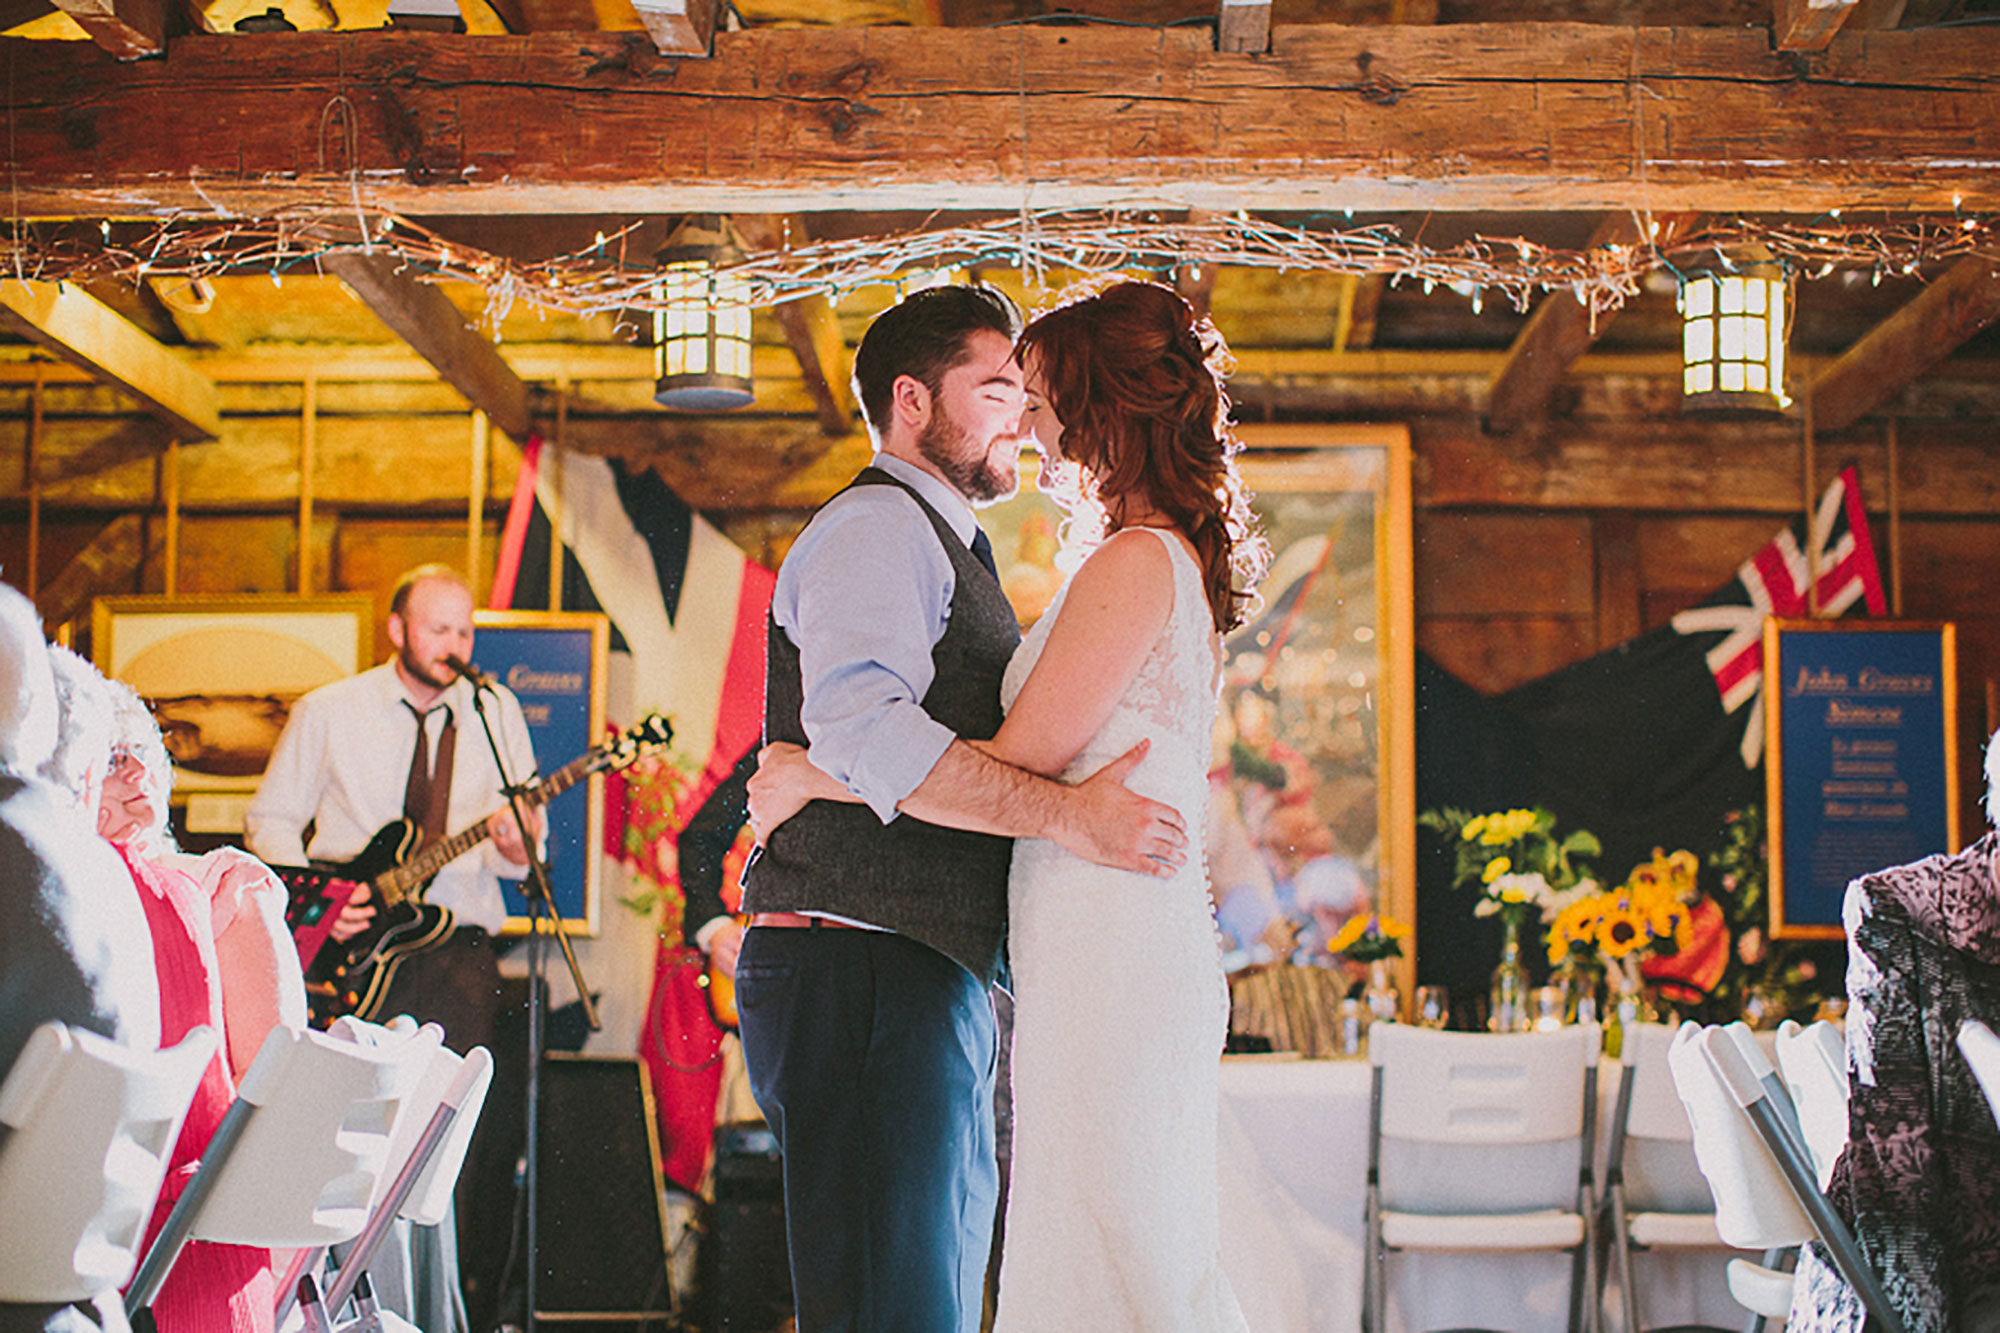 Navy-Hall-Wedding-Vineyard-Bride-Photo-By-Andrew-Mark-Photography-053.jpg